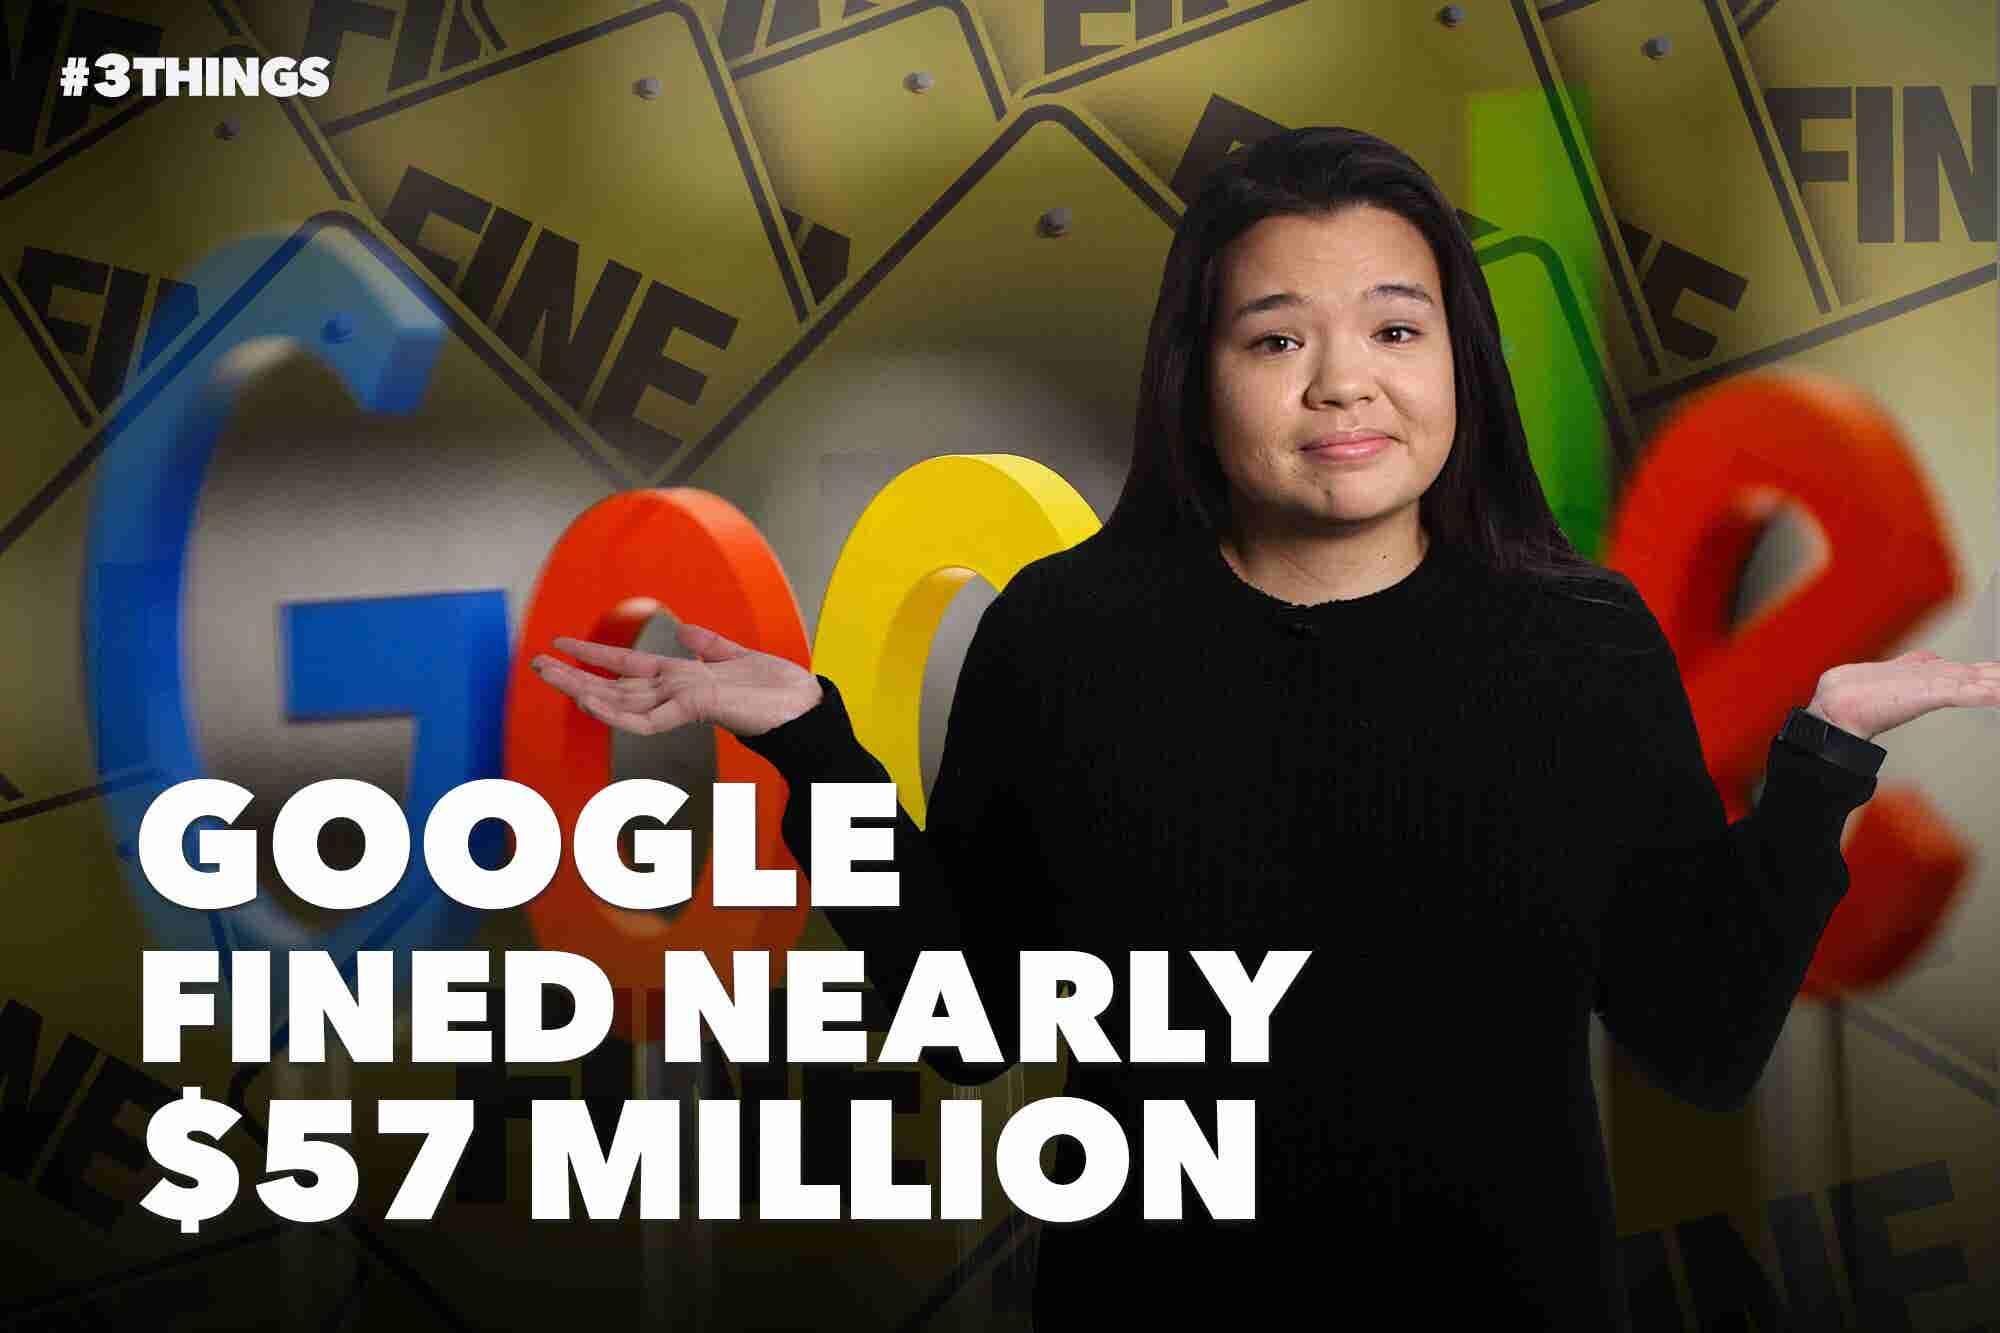 Google Fined $57 Million, Howard Schultz Exploring Presidential Run an...